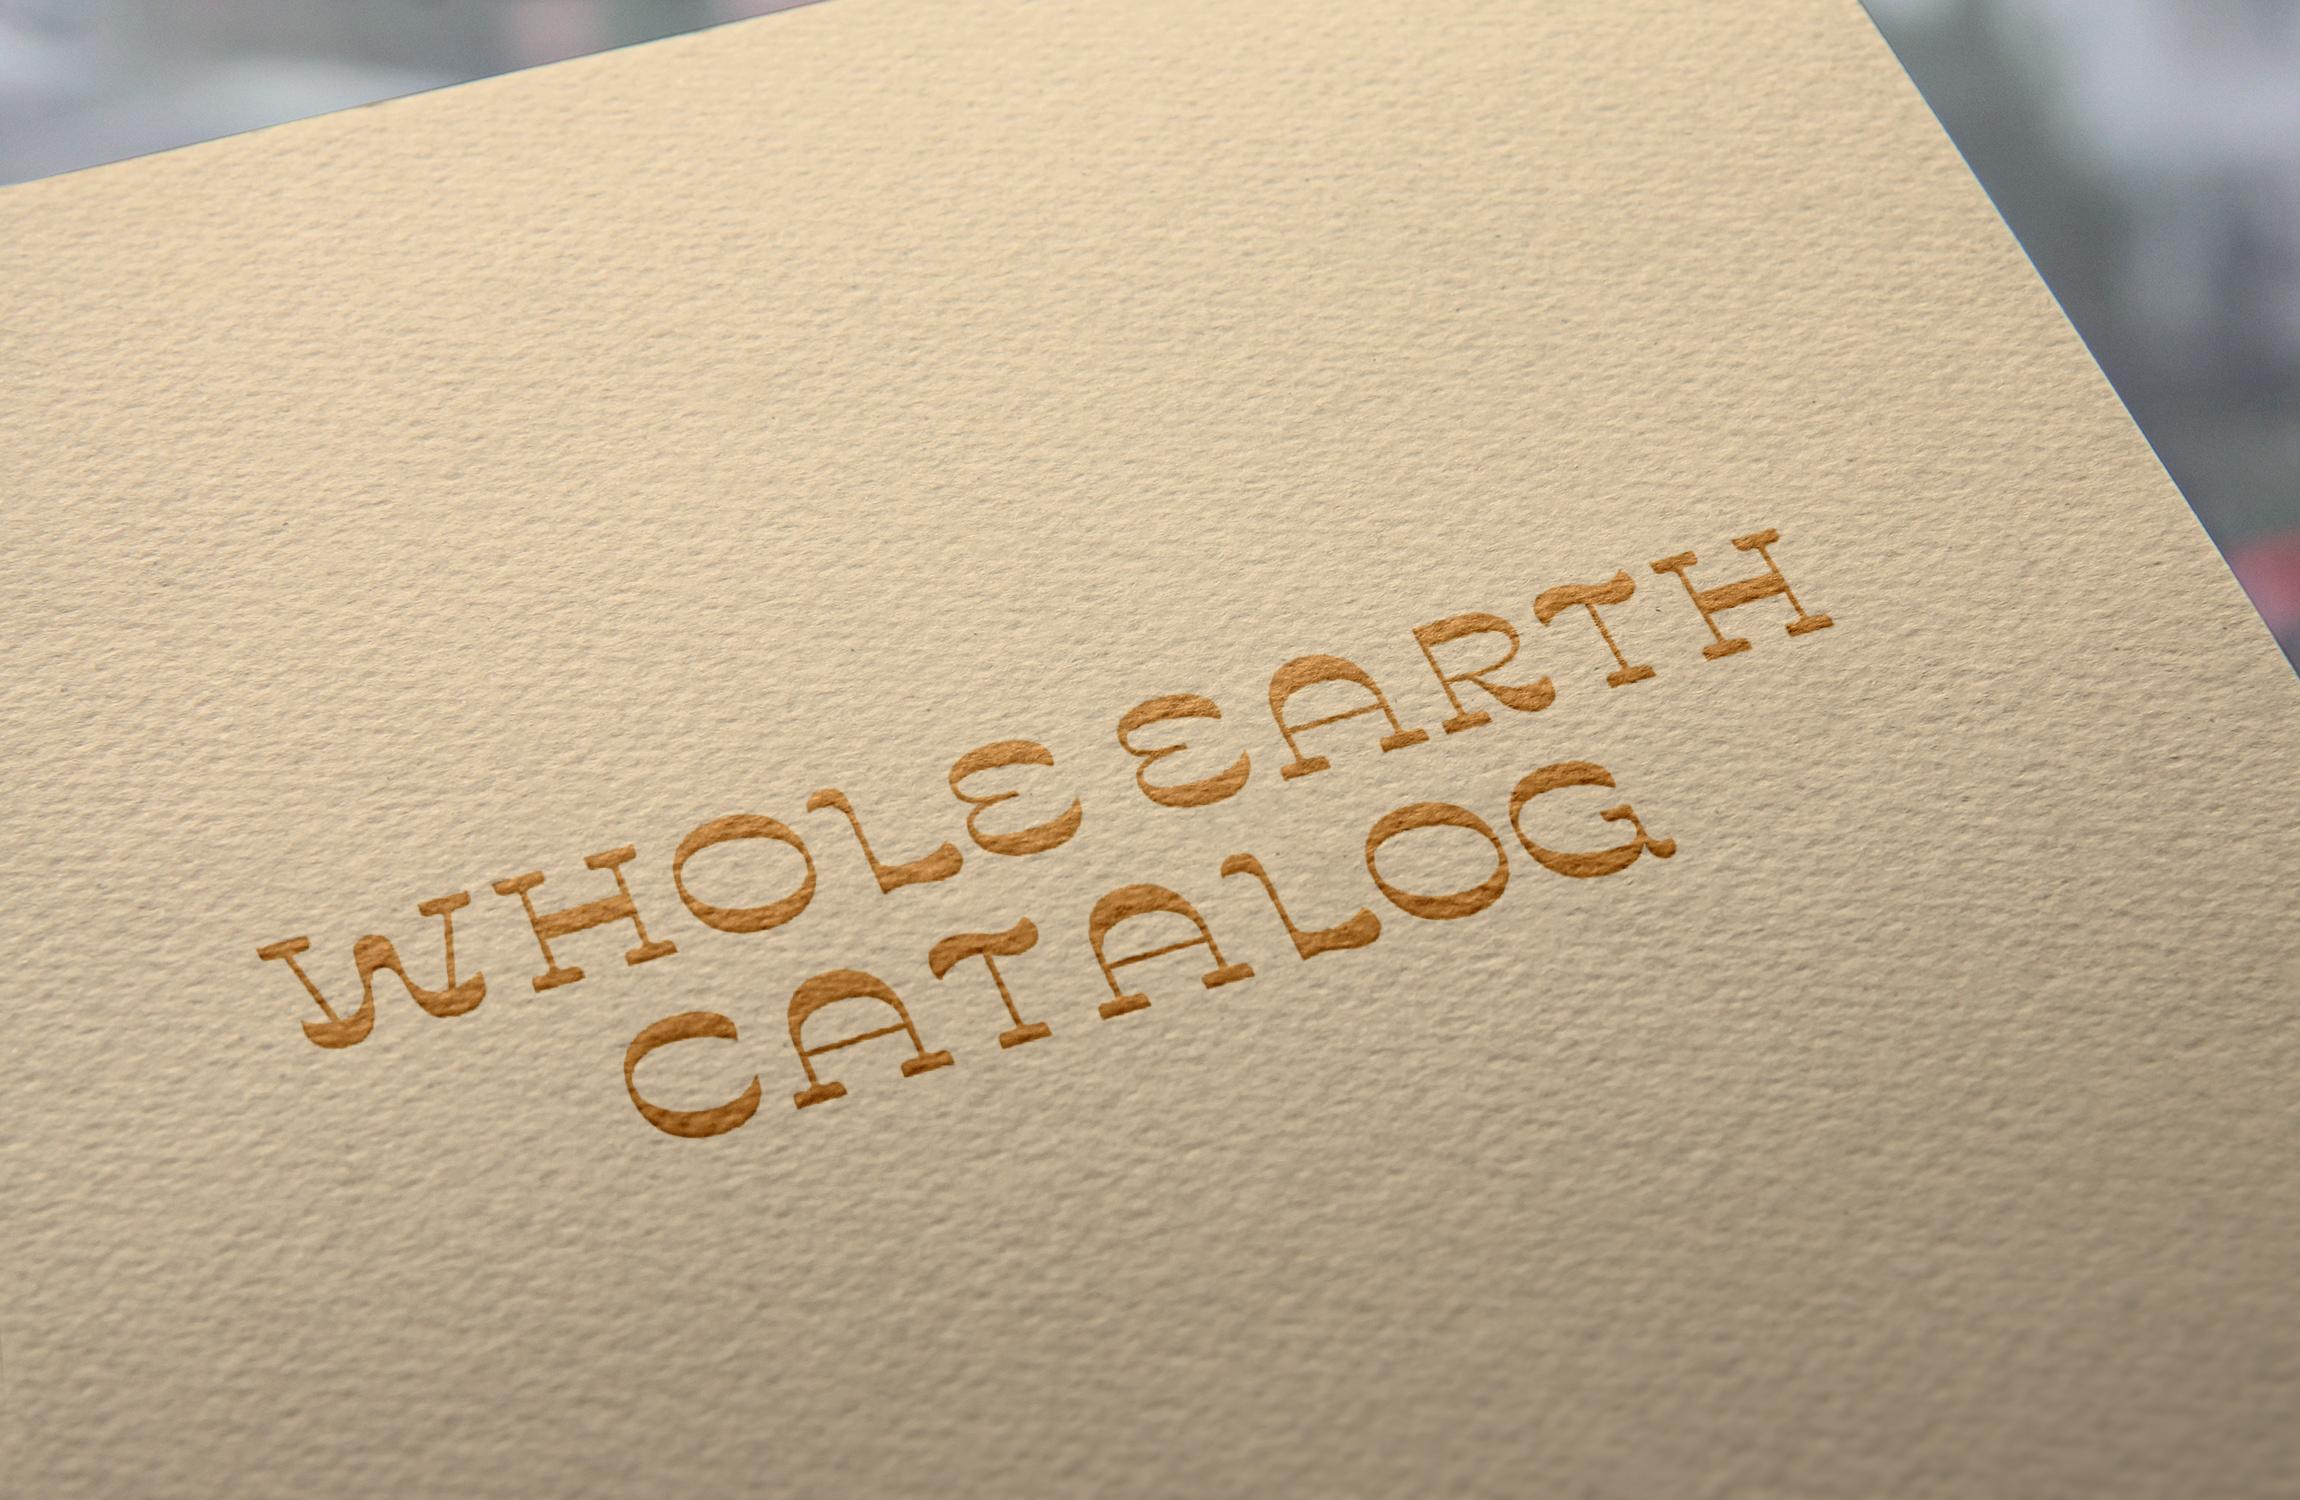 whole-earth-catalog